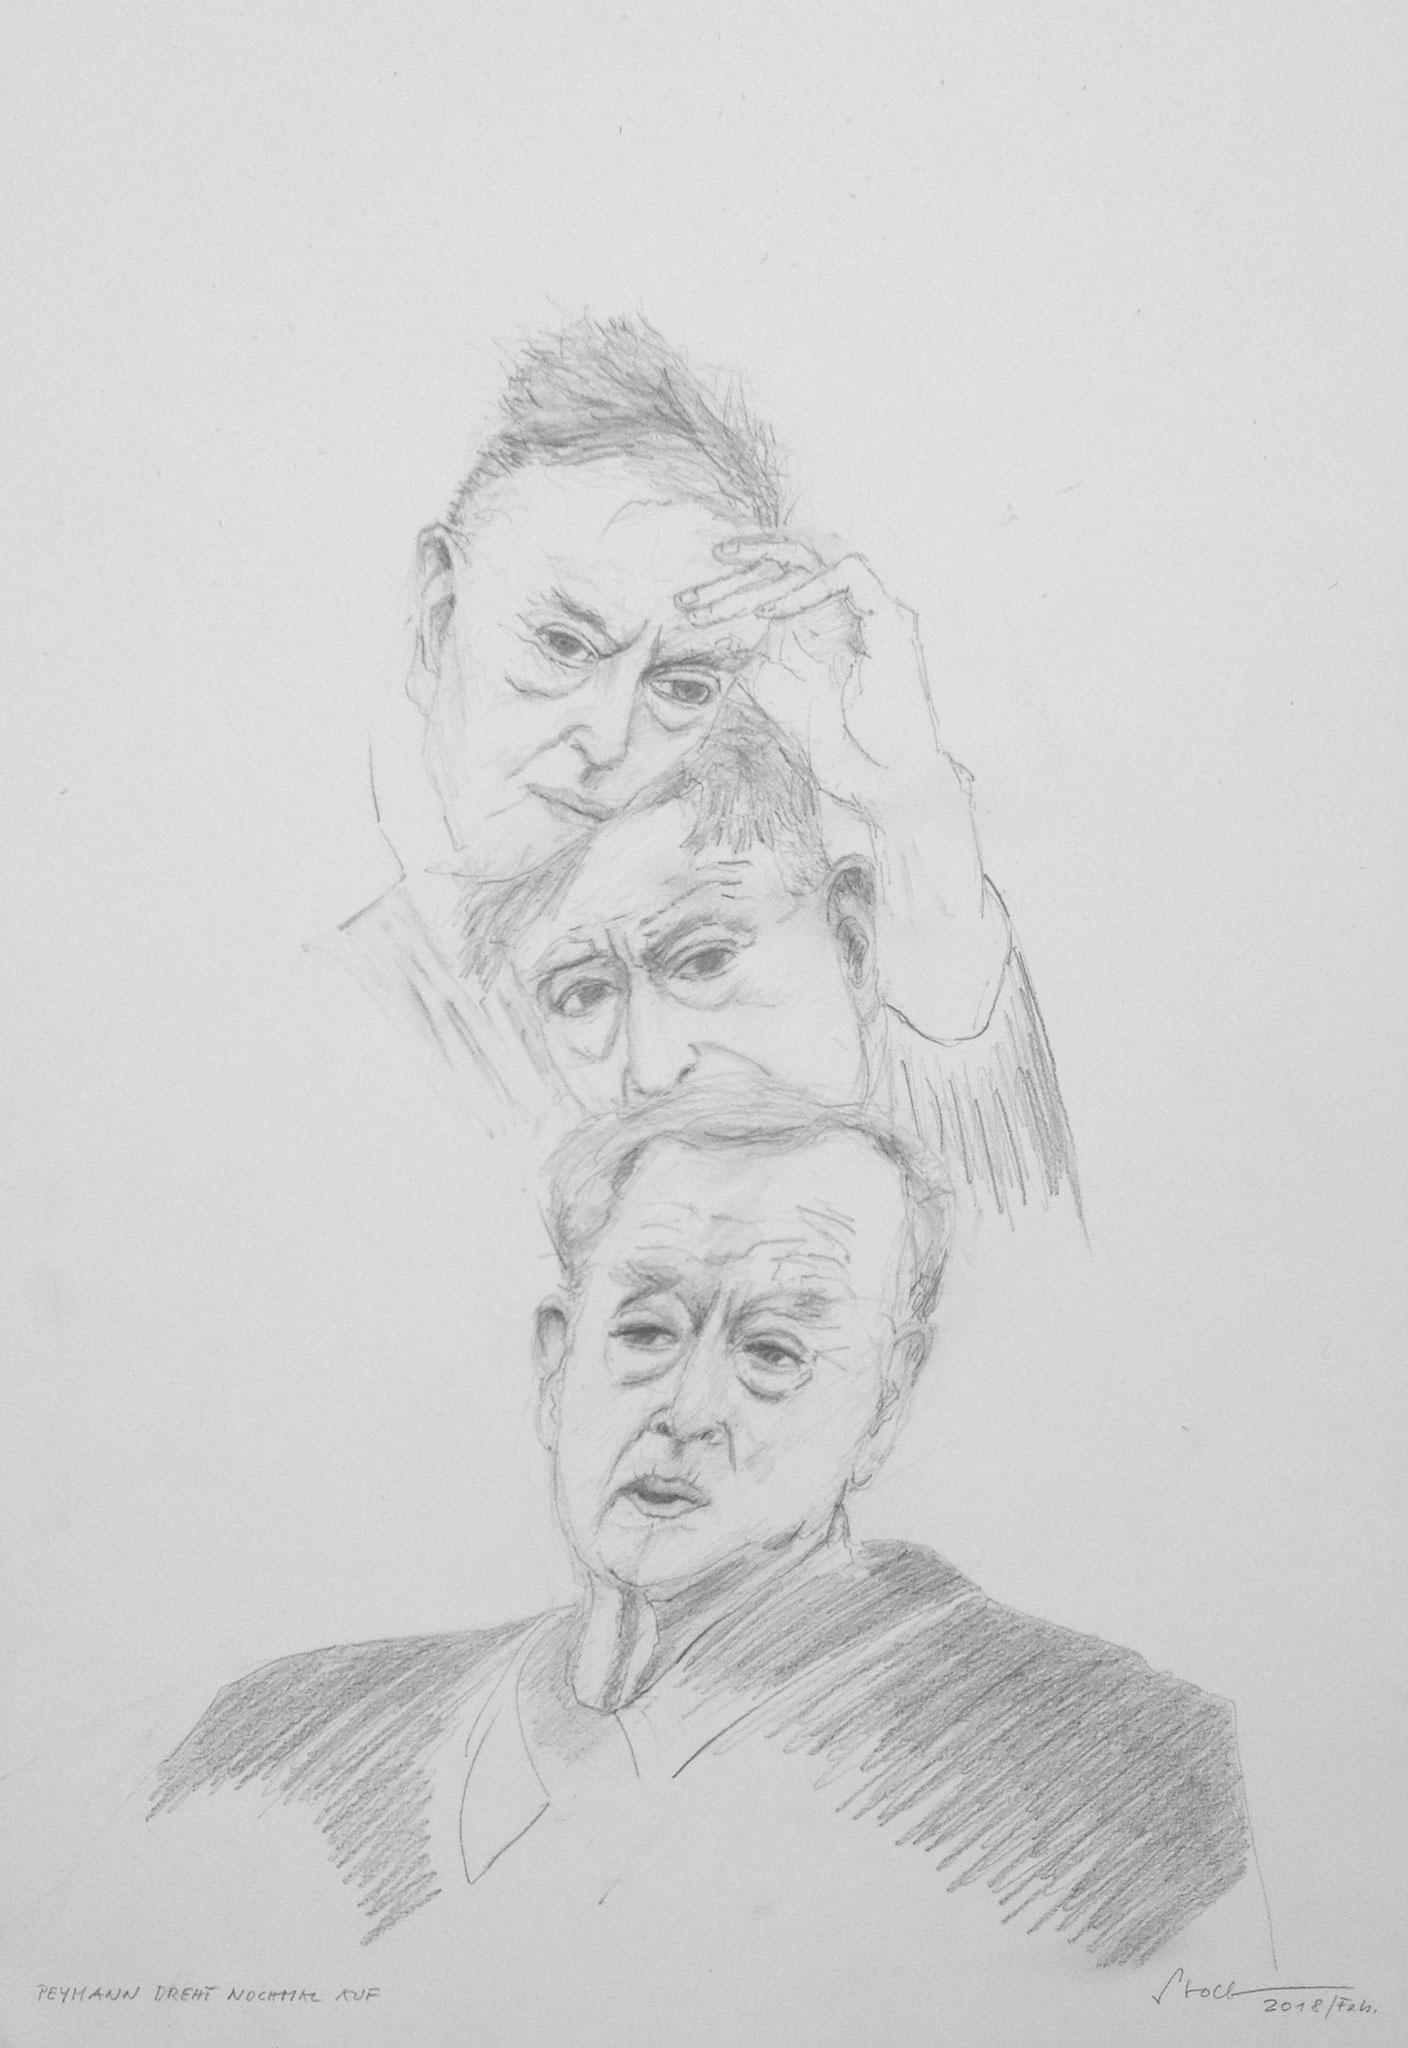 Peymann dreht nochmal auf II, 2018, Zeichnung, 40 x 30 cm (#941)